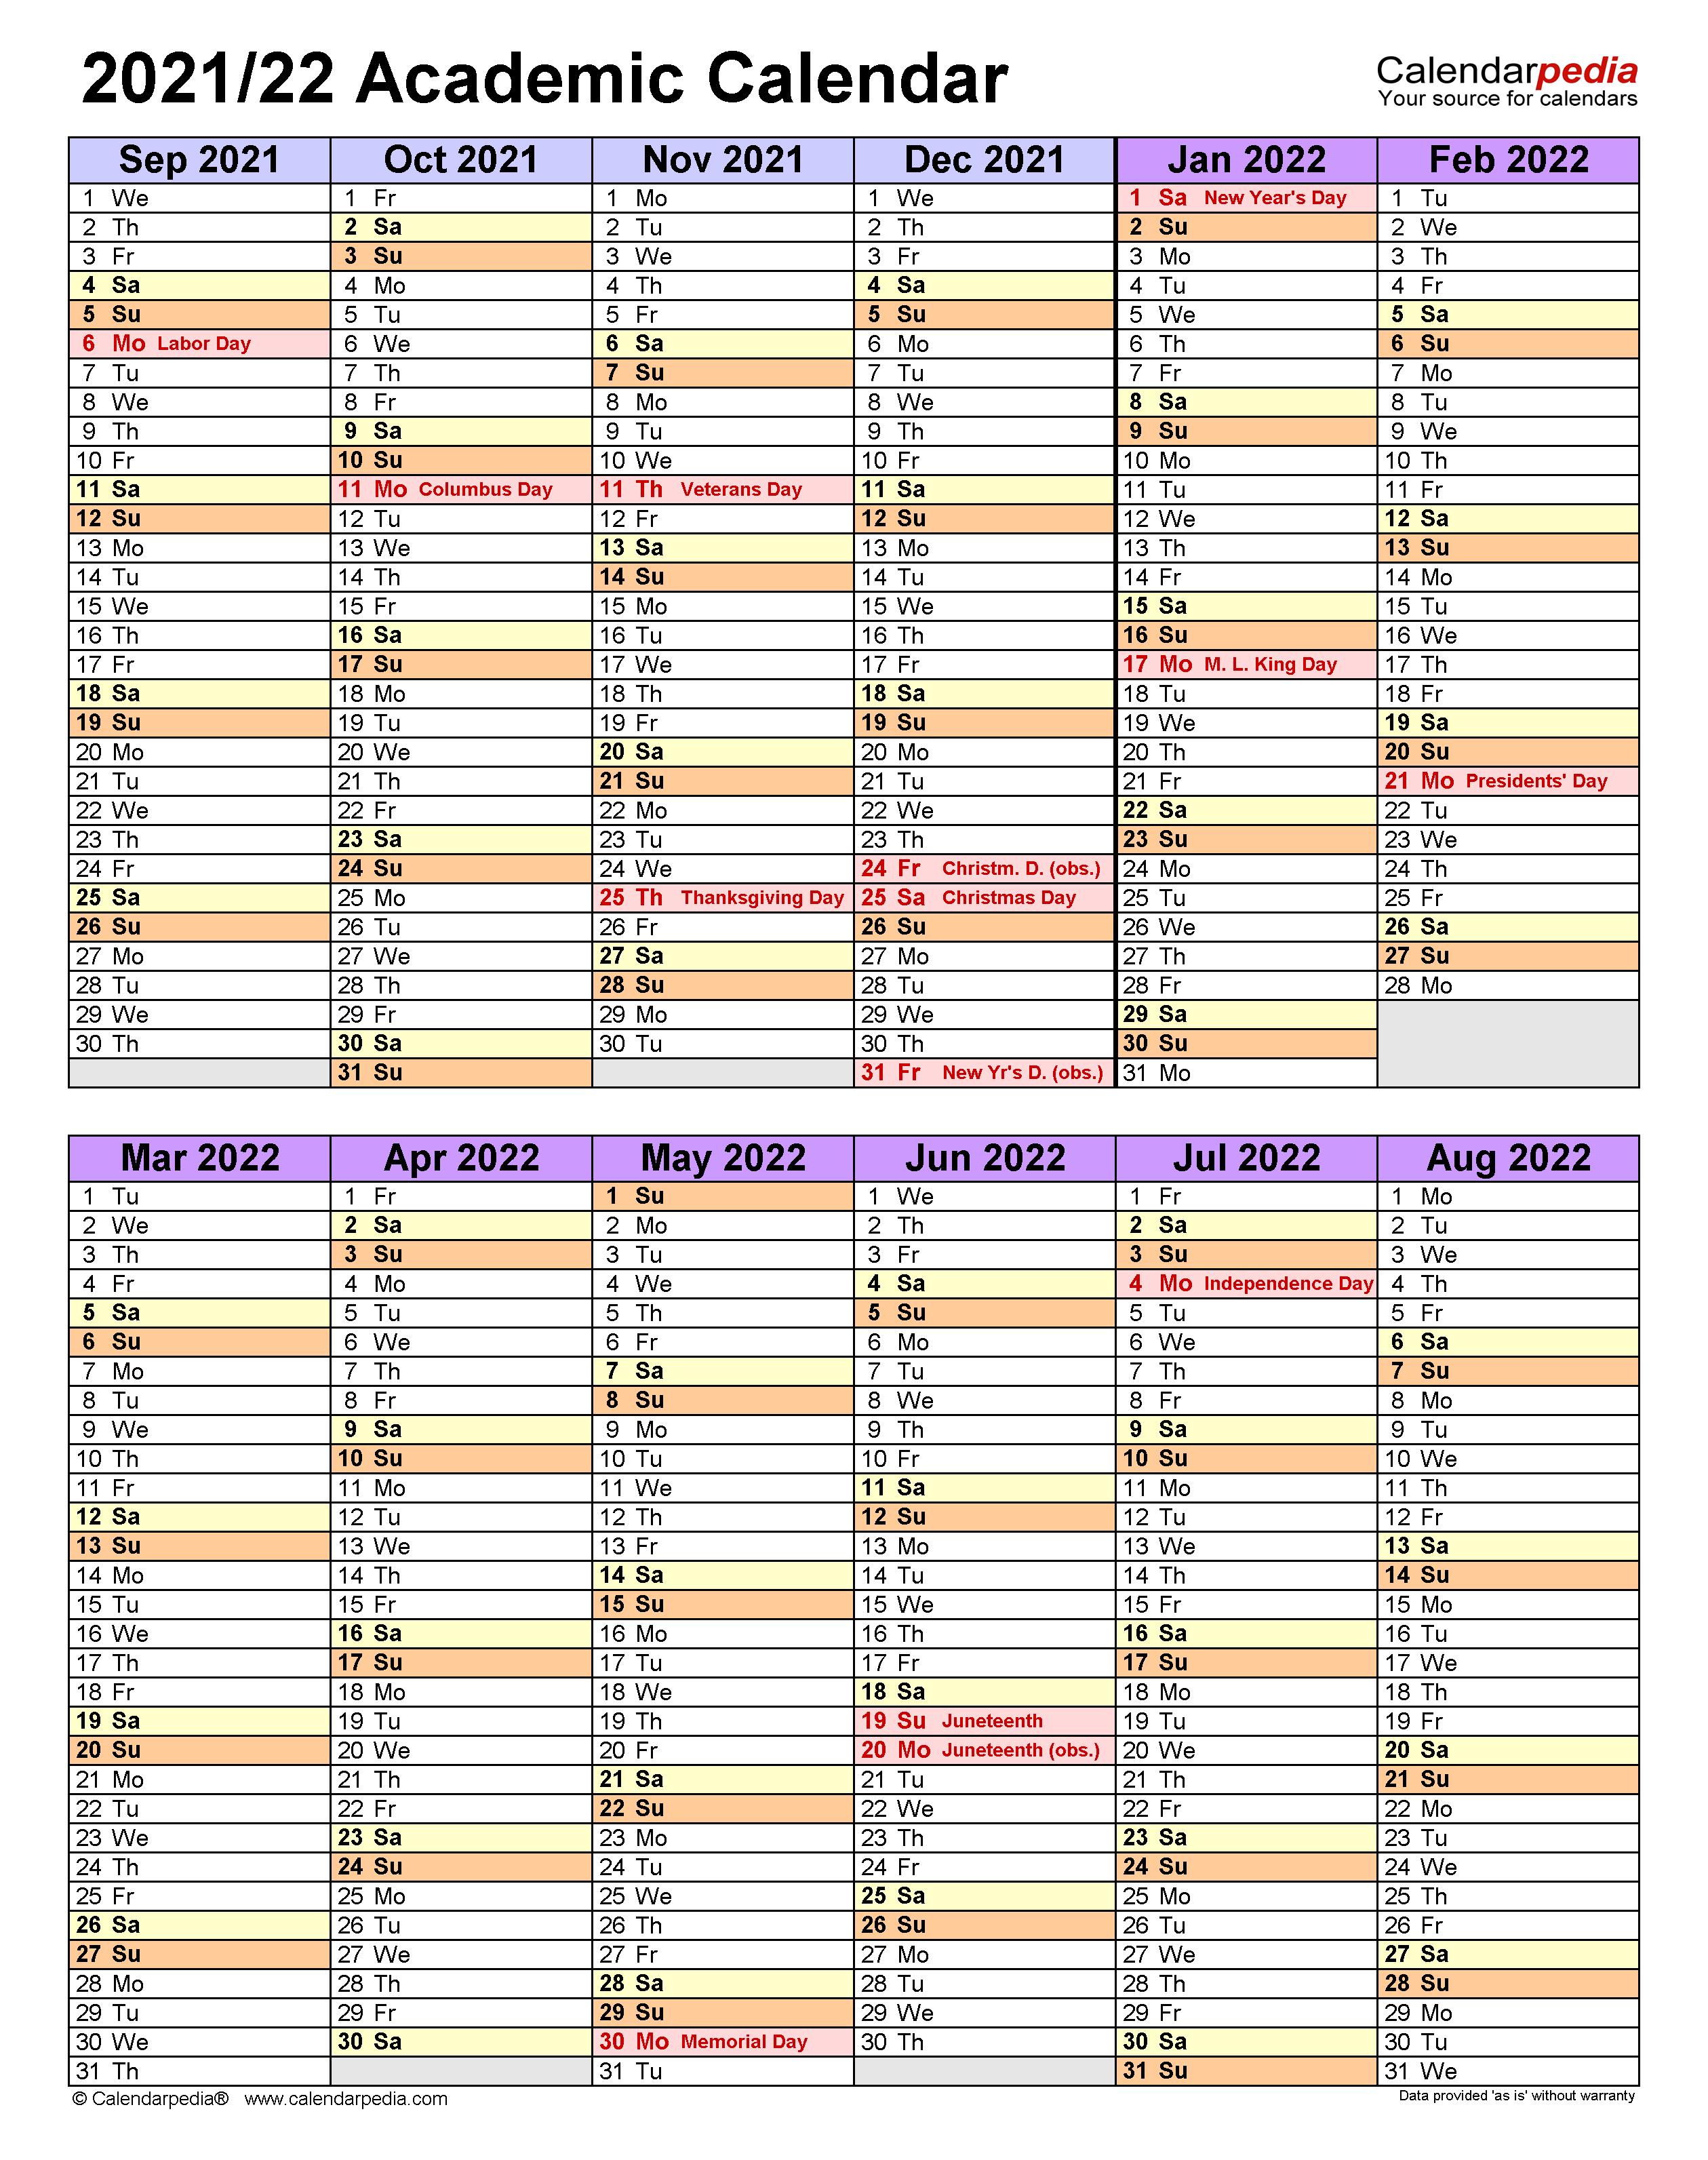 Mississippi State Academic Calendar 2022.Academic Calendars 2021 2022 Free Printable Word Templates